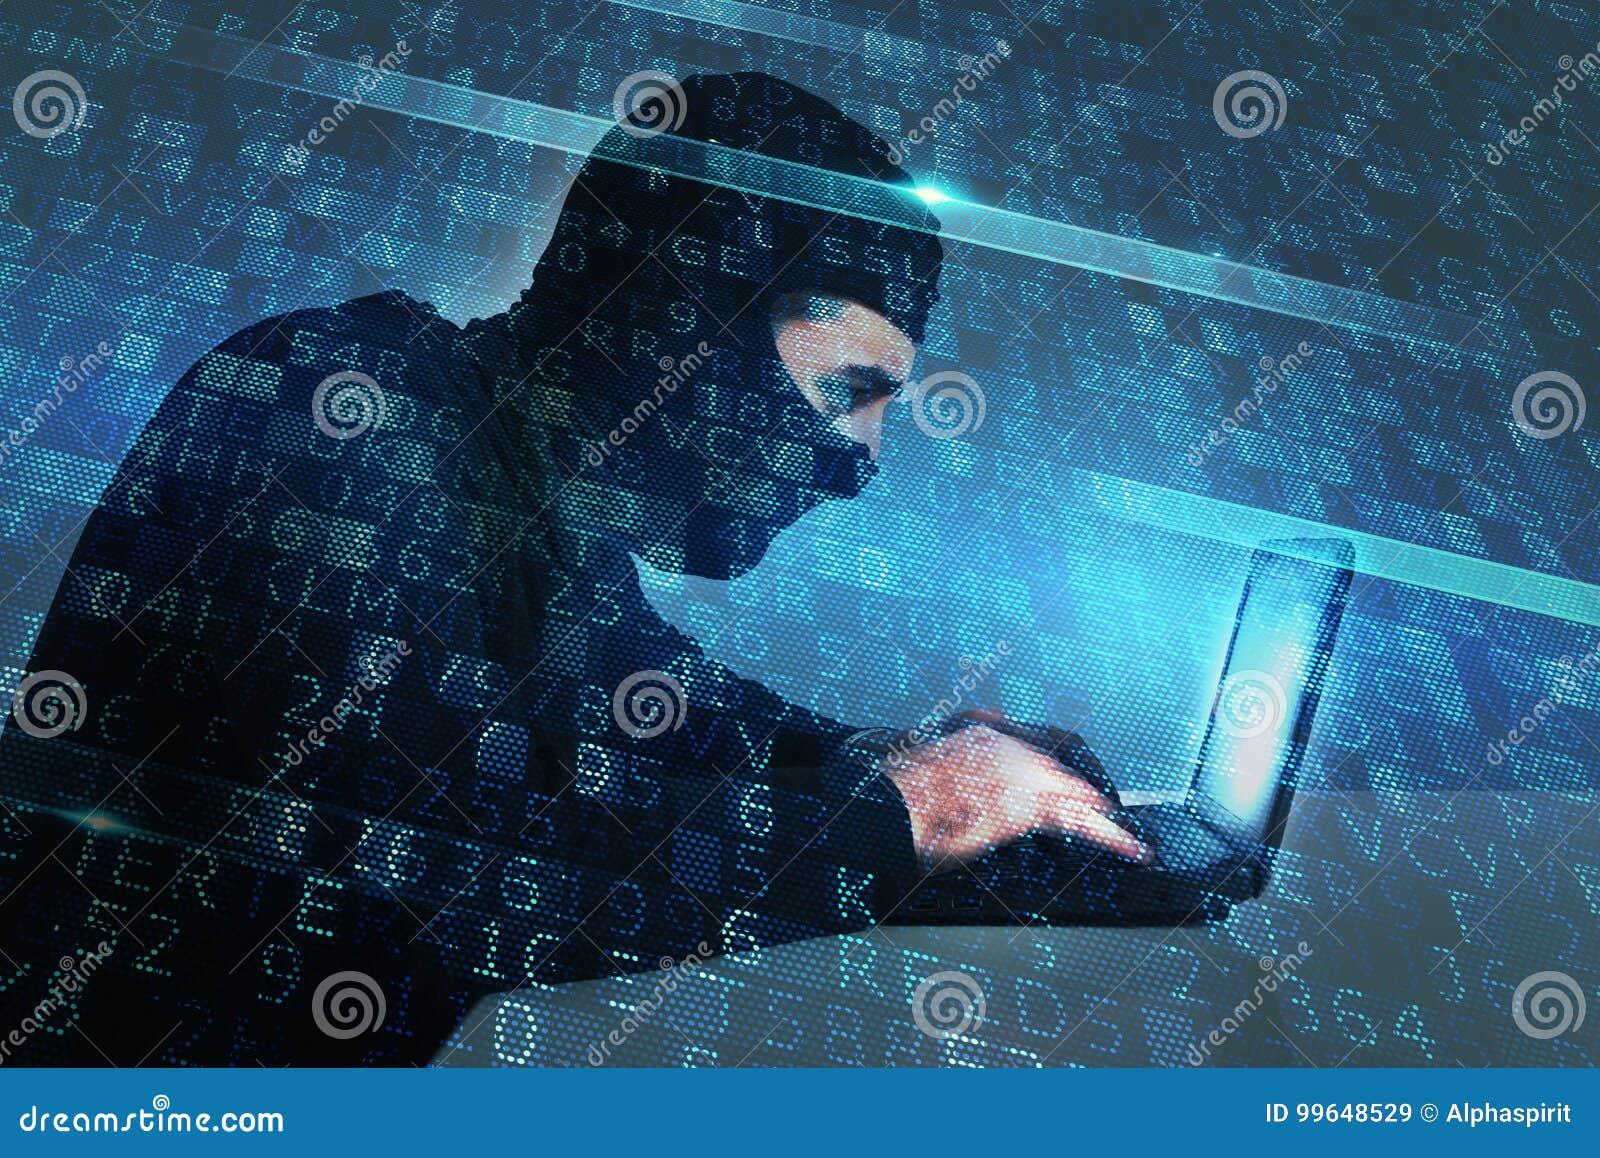 Hacker creates a backdoor access on a computer. Concept of internet security